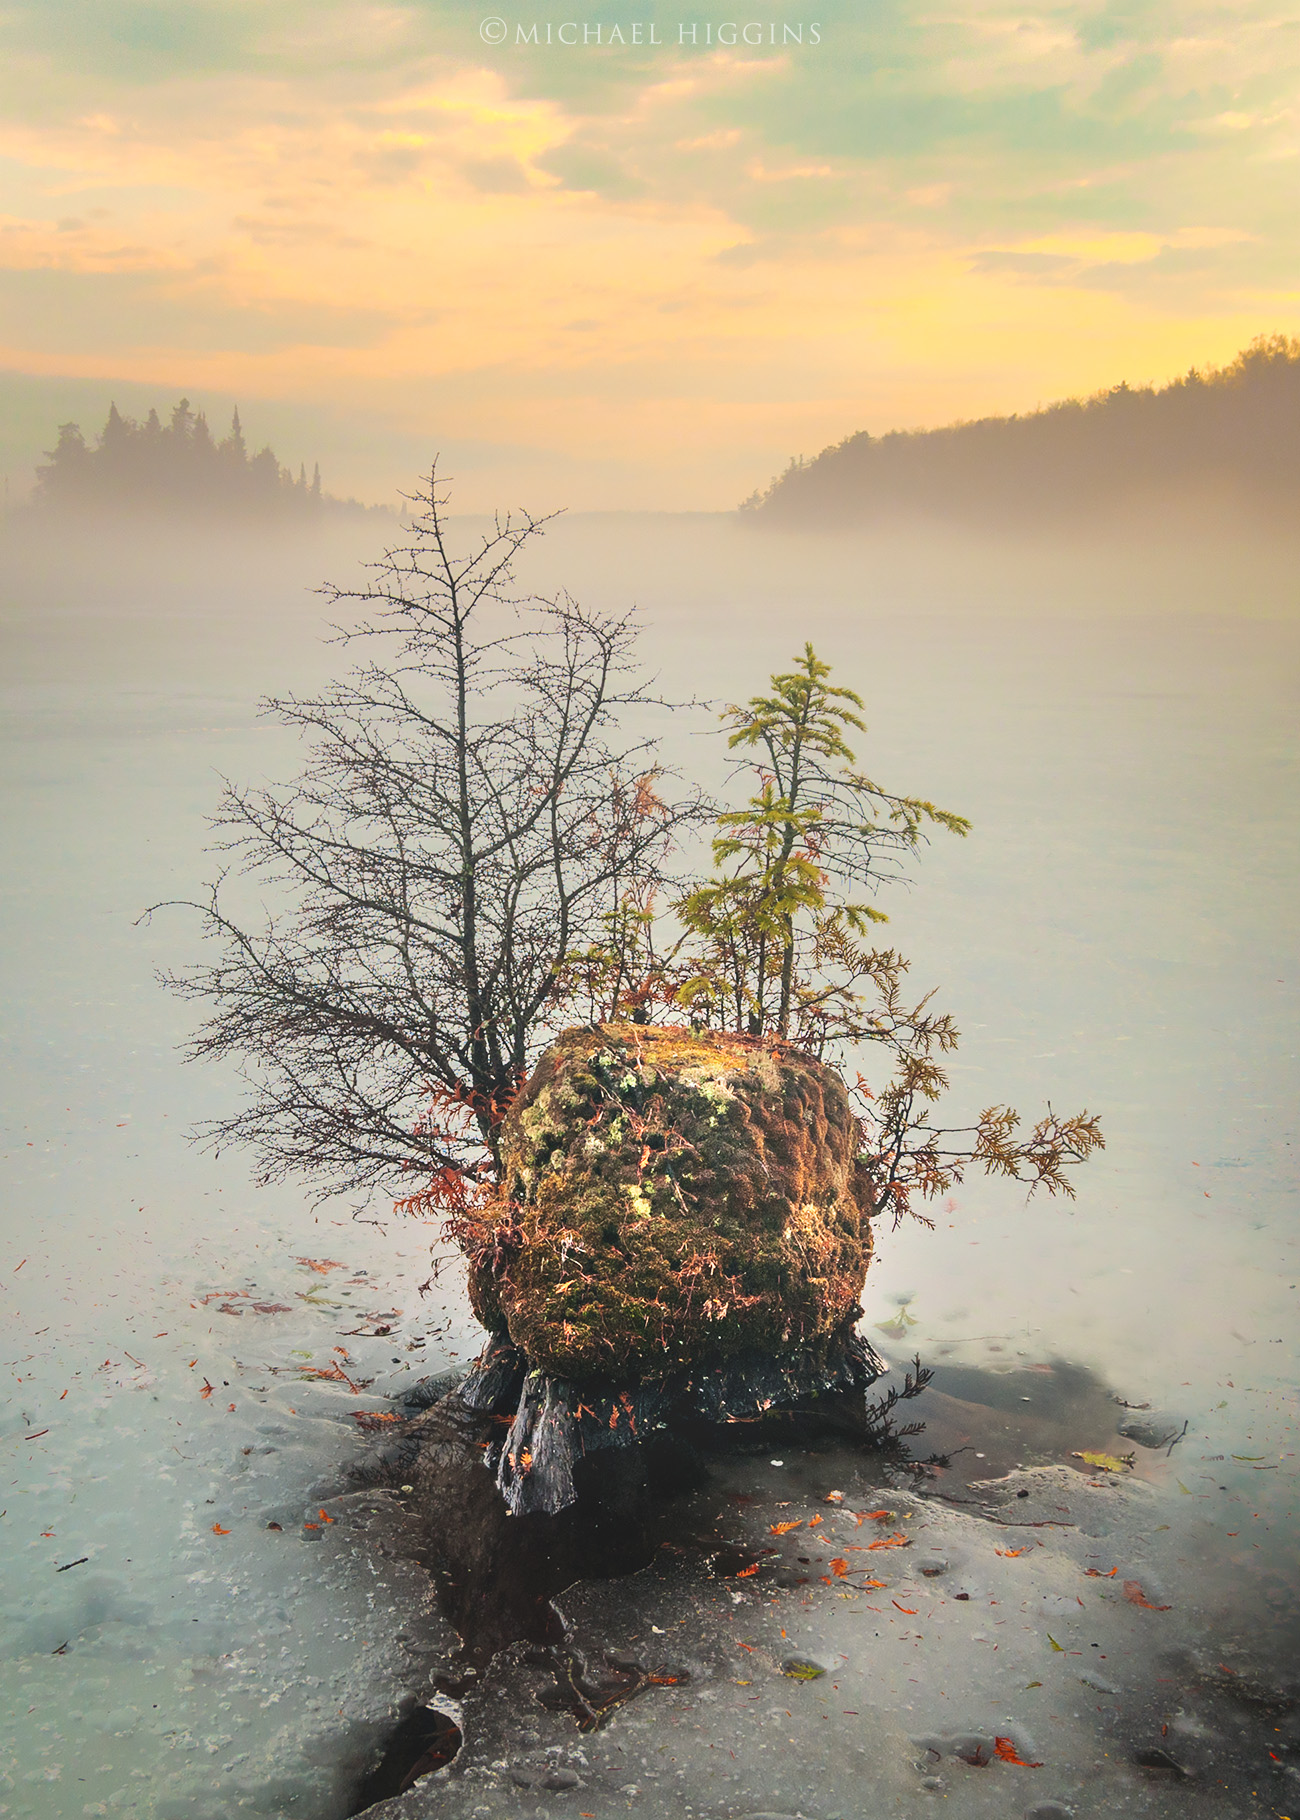 """Bonsai Island"" - Photographer: Michael Higgins"